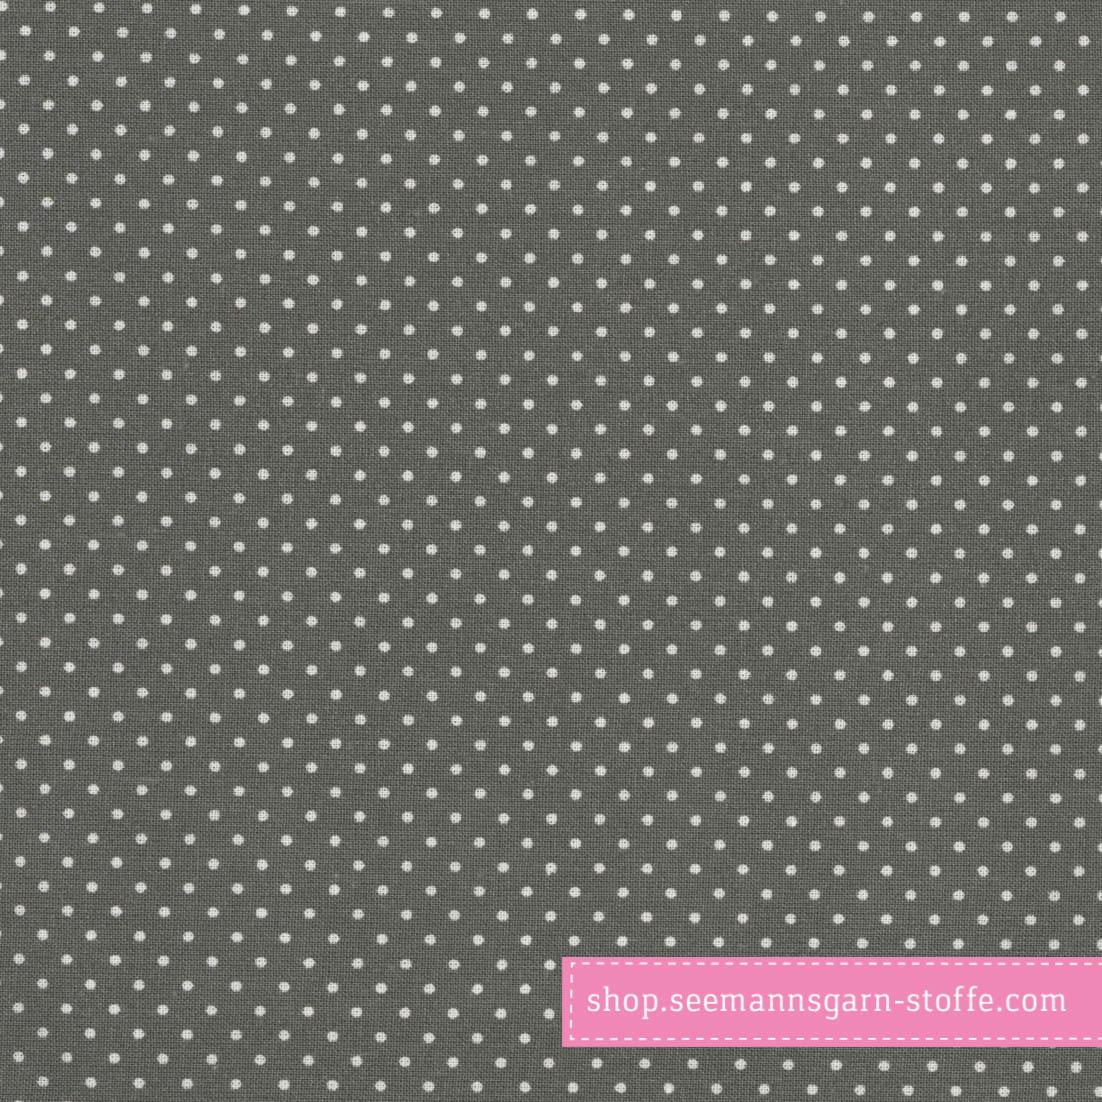 Wachstuch - Oilcloth Dots Charcoal